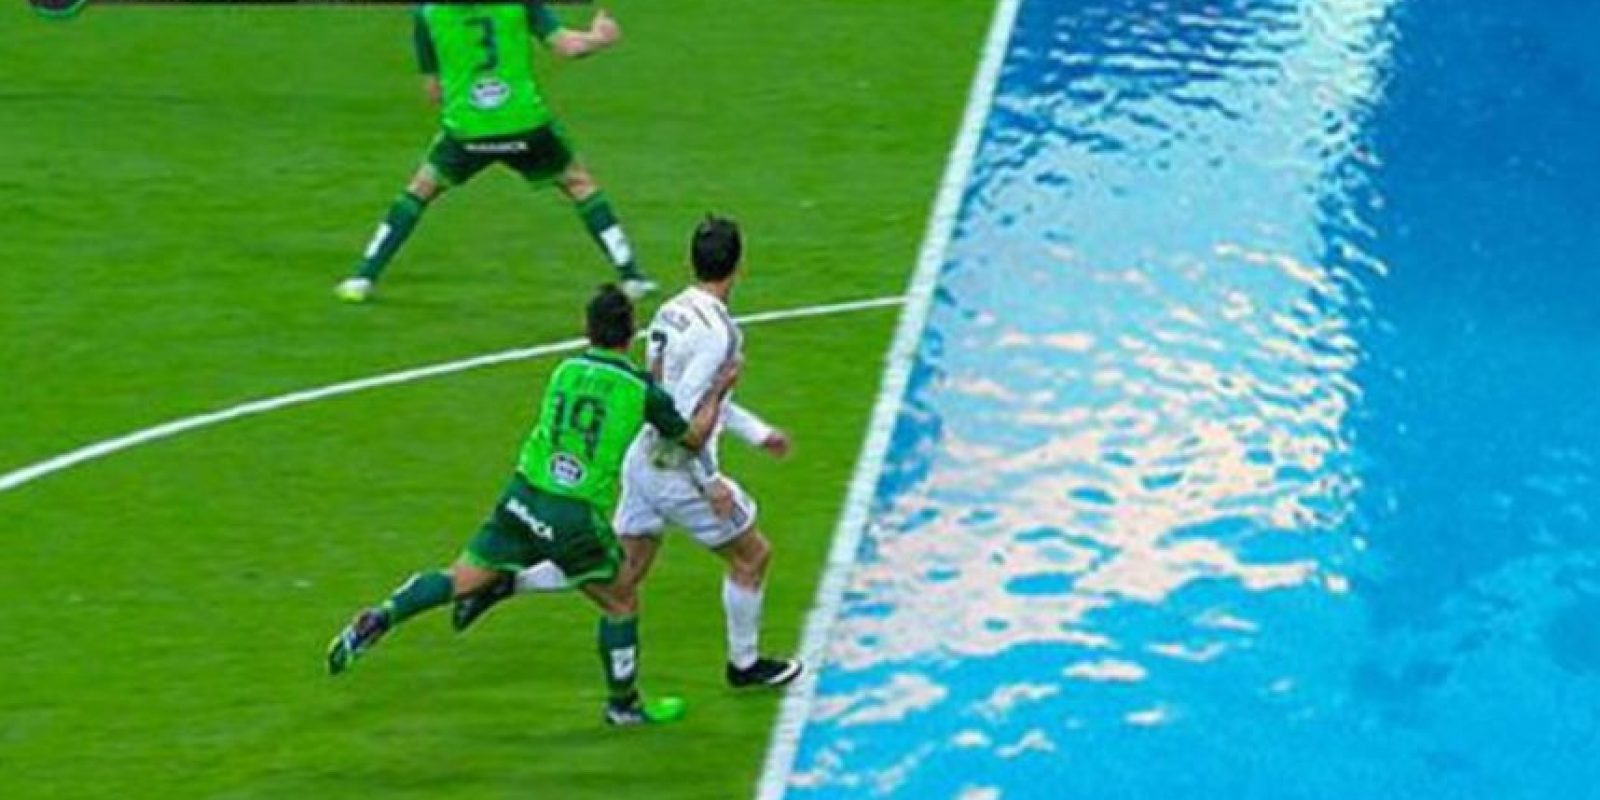 Se burlaron por su piscinazo ante Celta de Vigo Foto:Twitter